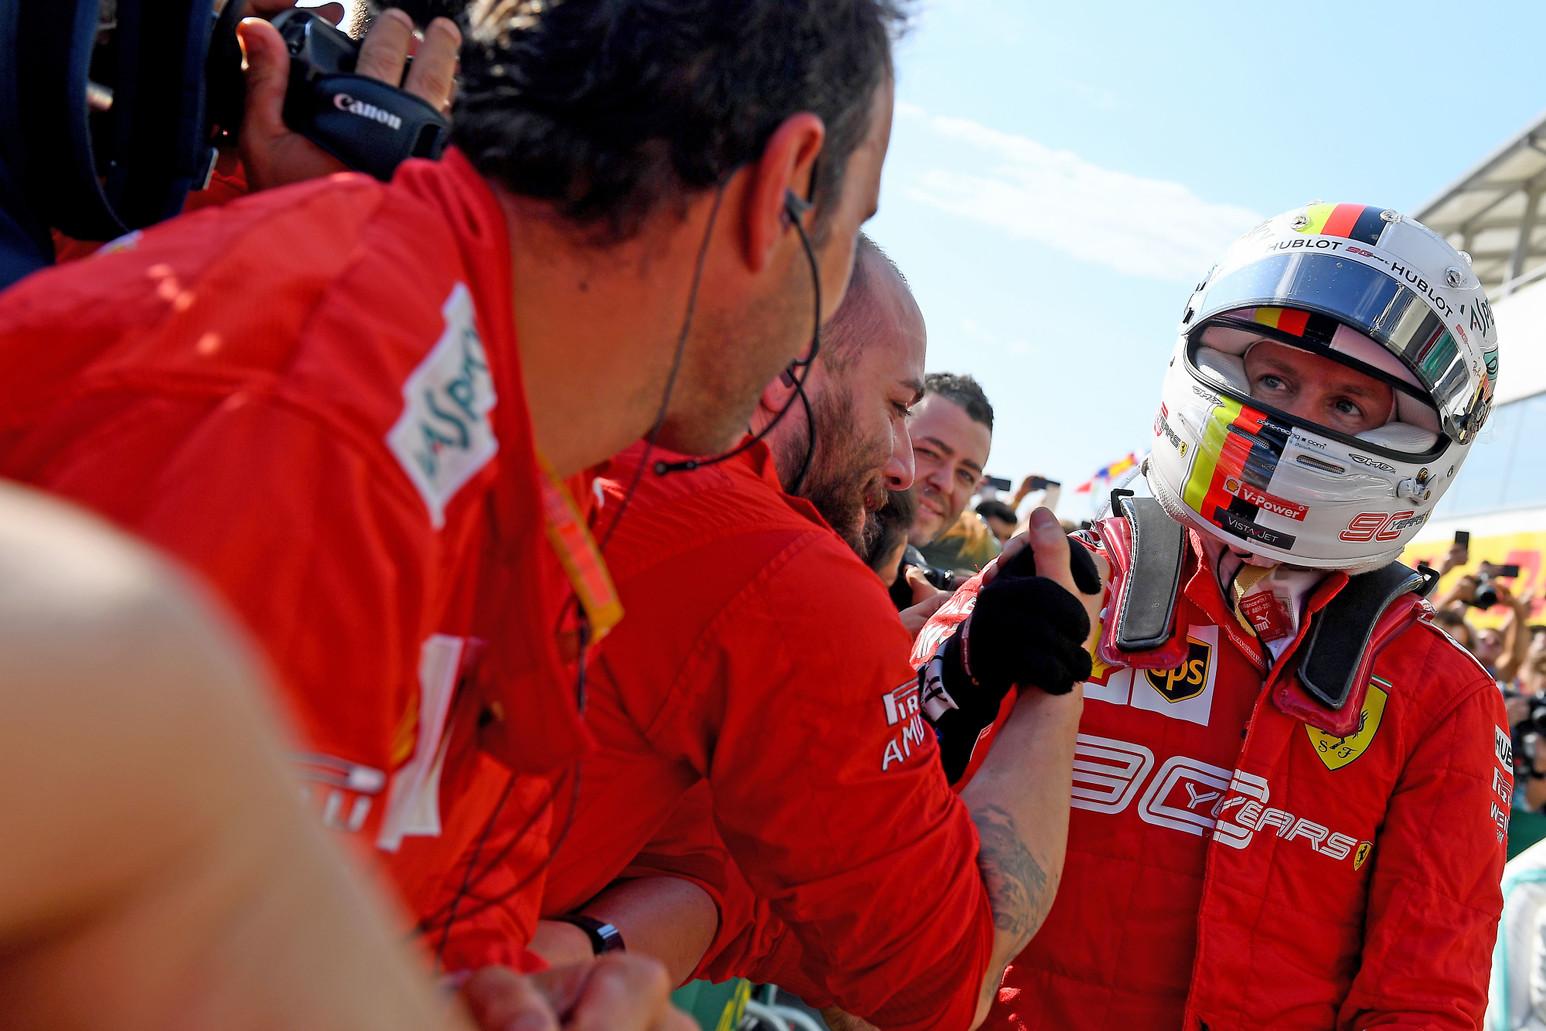 Hungarian GP 2019 - Sunday - Sebastian Vettel - Hungaroring 2019